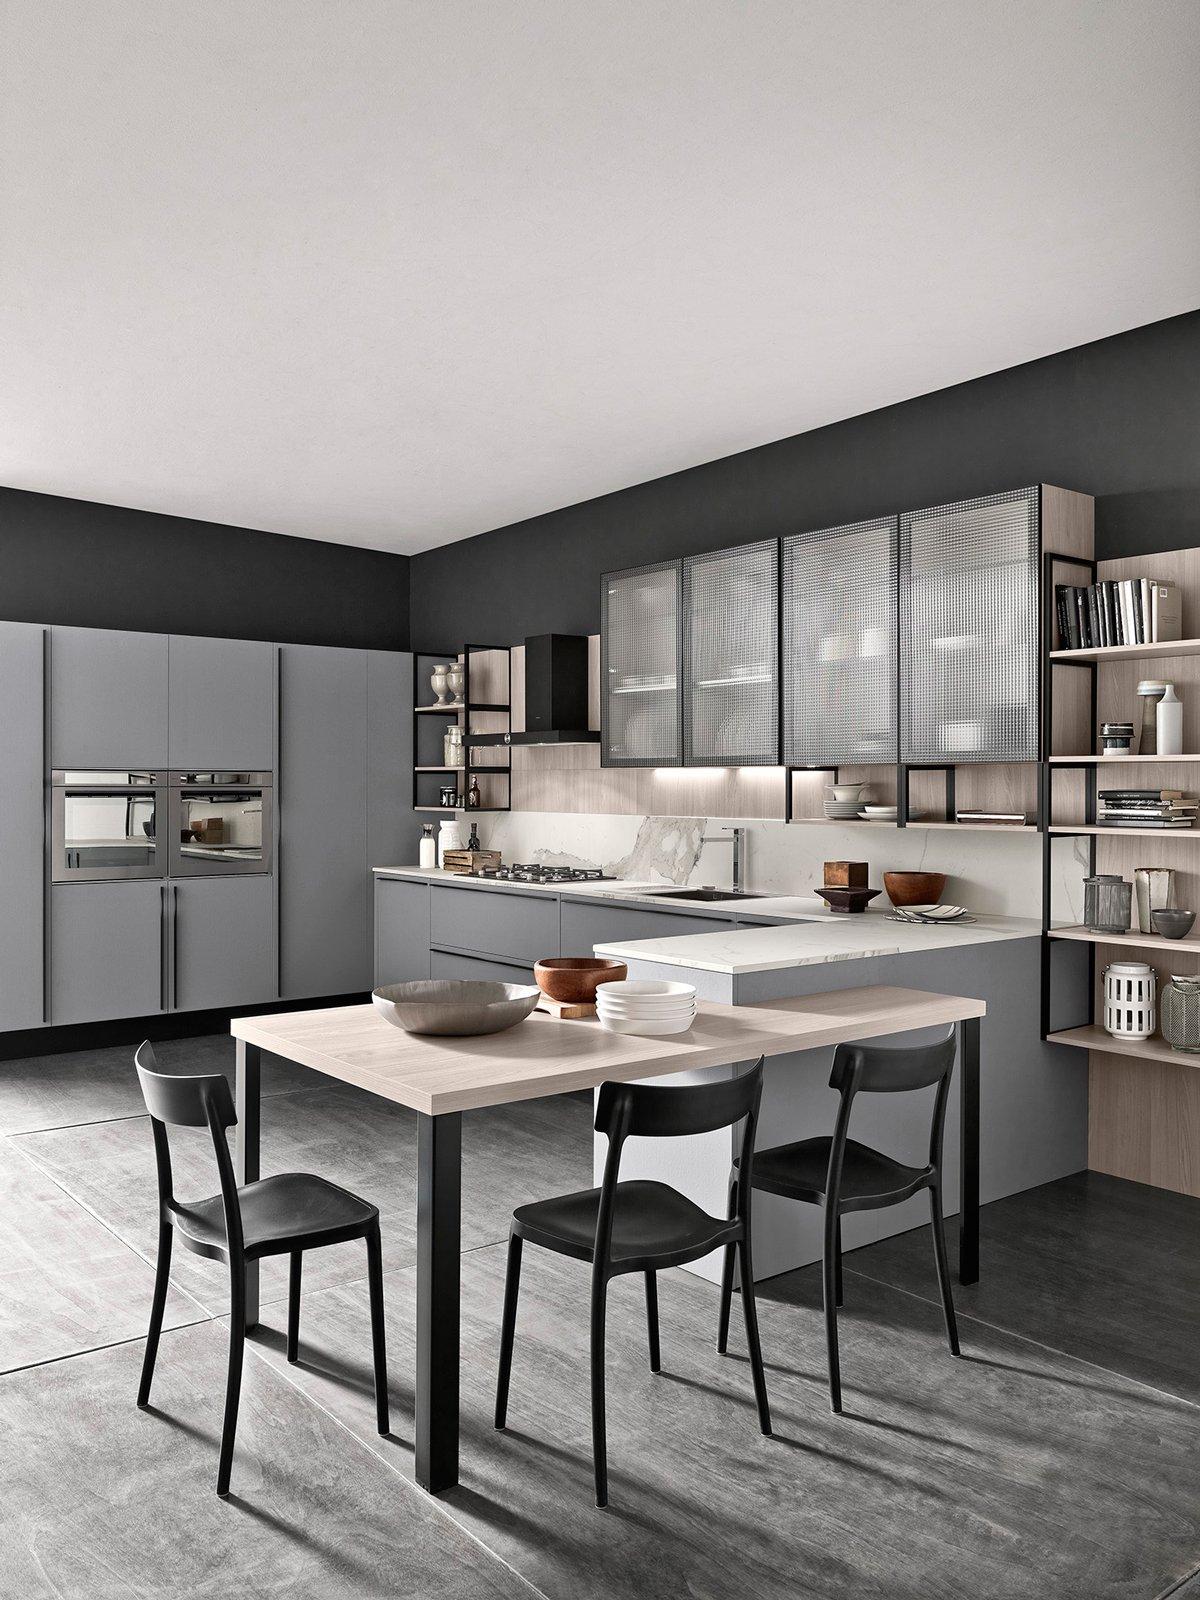 Cucine stile industriale top cucine in stile industriale for Cucina stile industriale